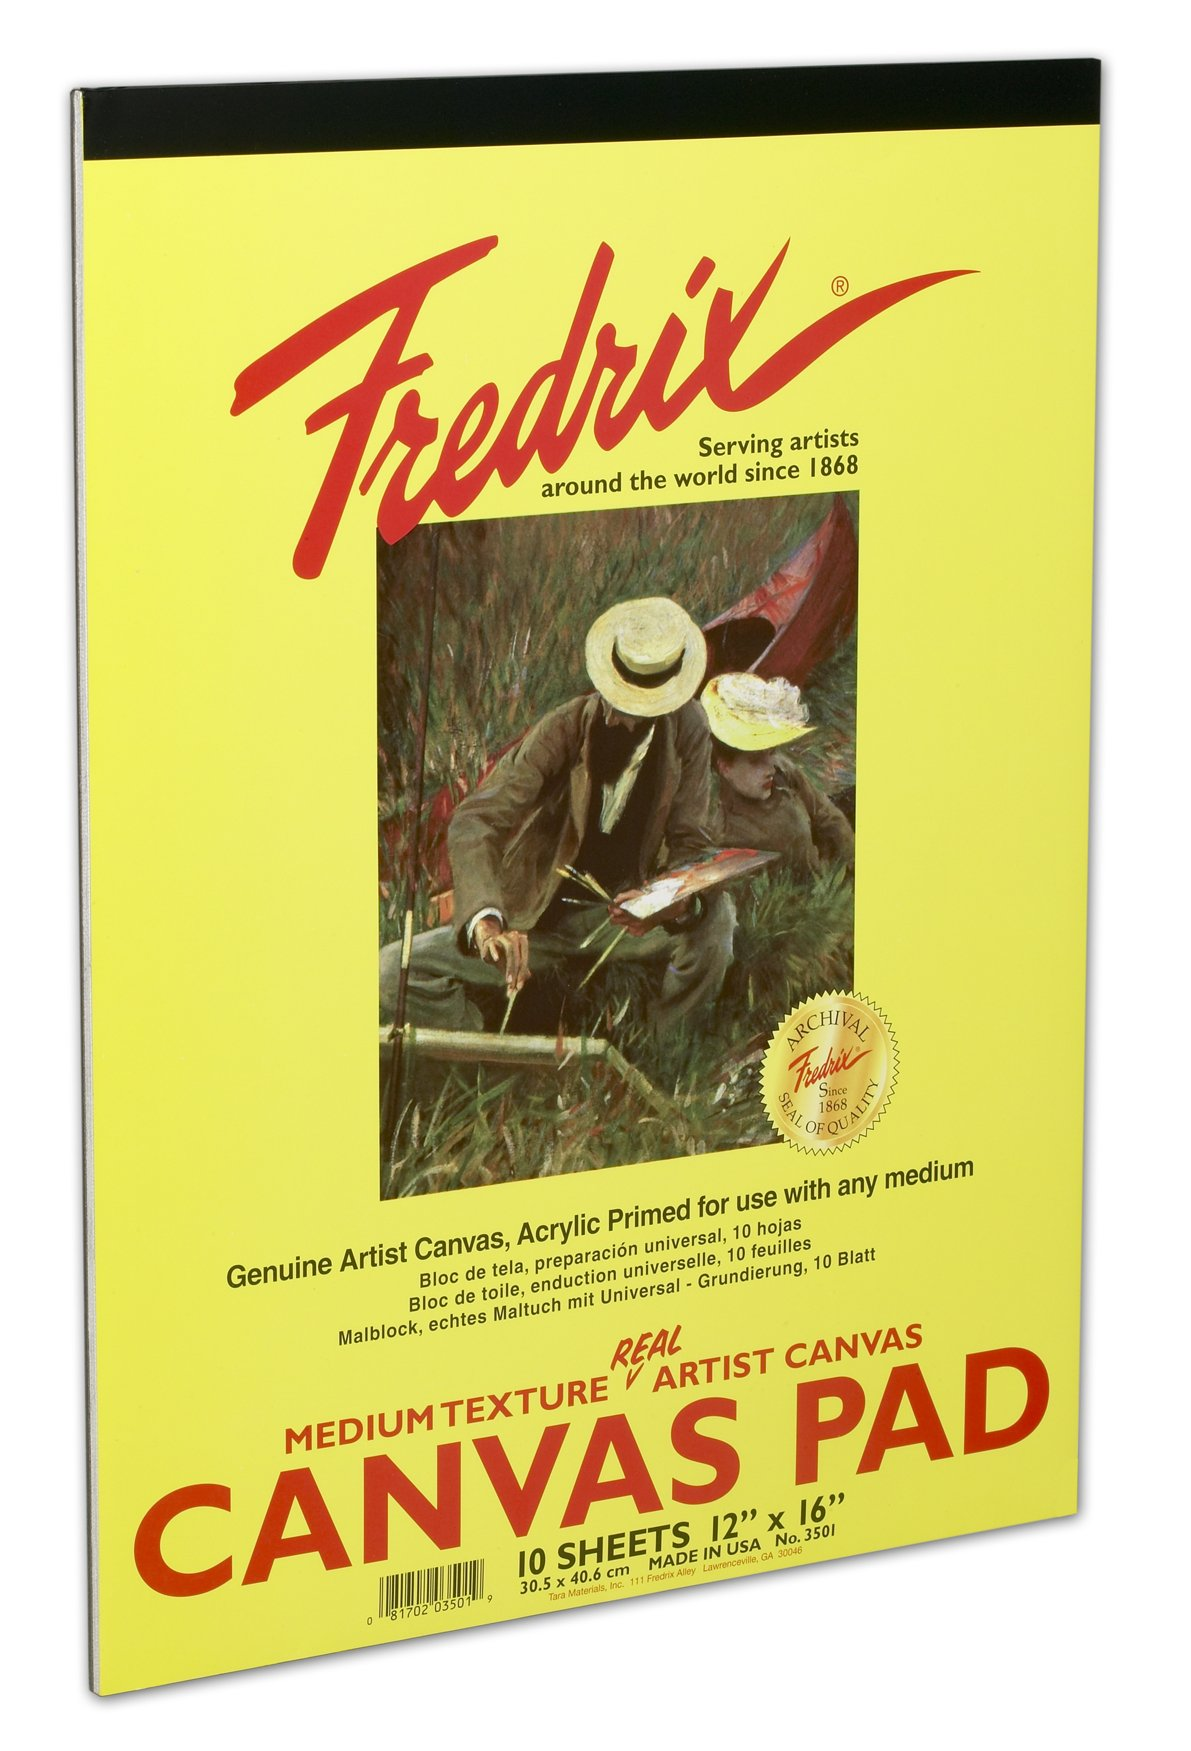 Fredrix 3501 Canvas Pads, 12 by 16-Inch by Fredrix